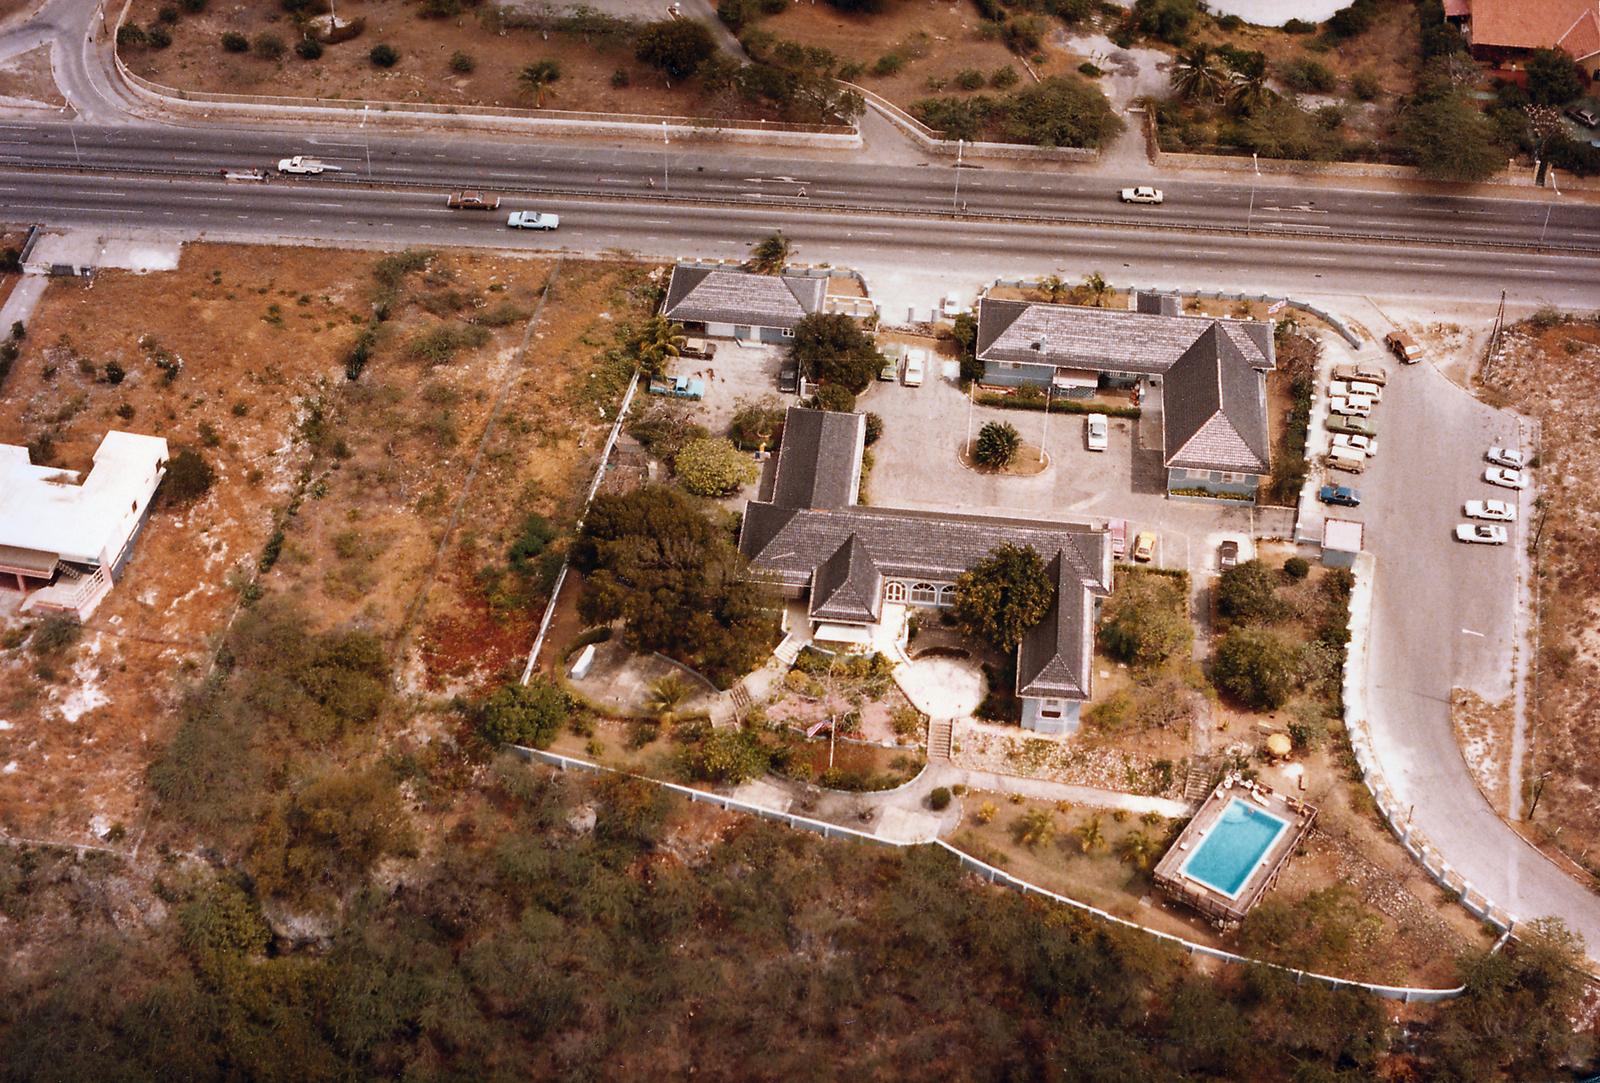 Curacao - Compound Site - 1983